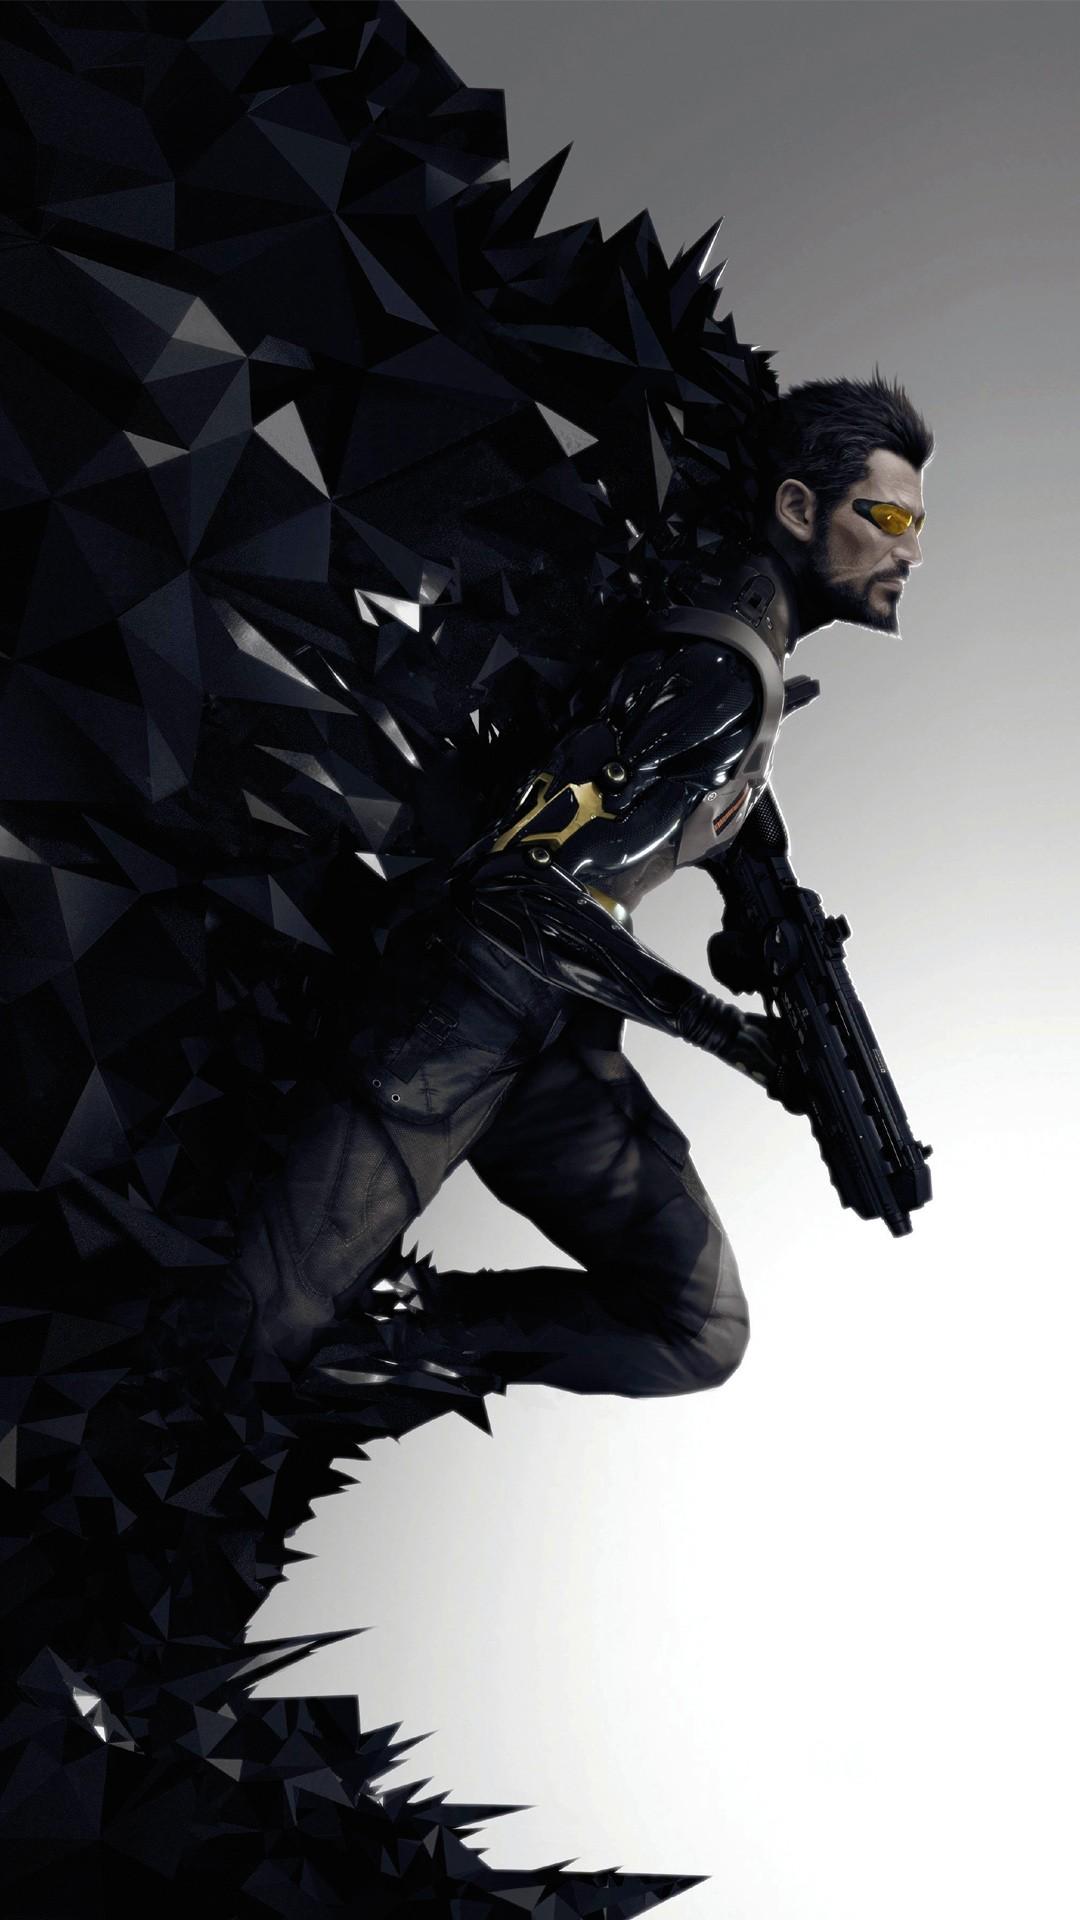 Ios 7 Hd Wallpaper Download Deus Ex Mankind Divided 2016 Wallpapers Hd Wallpapers